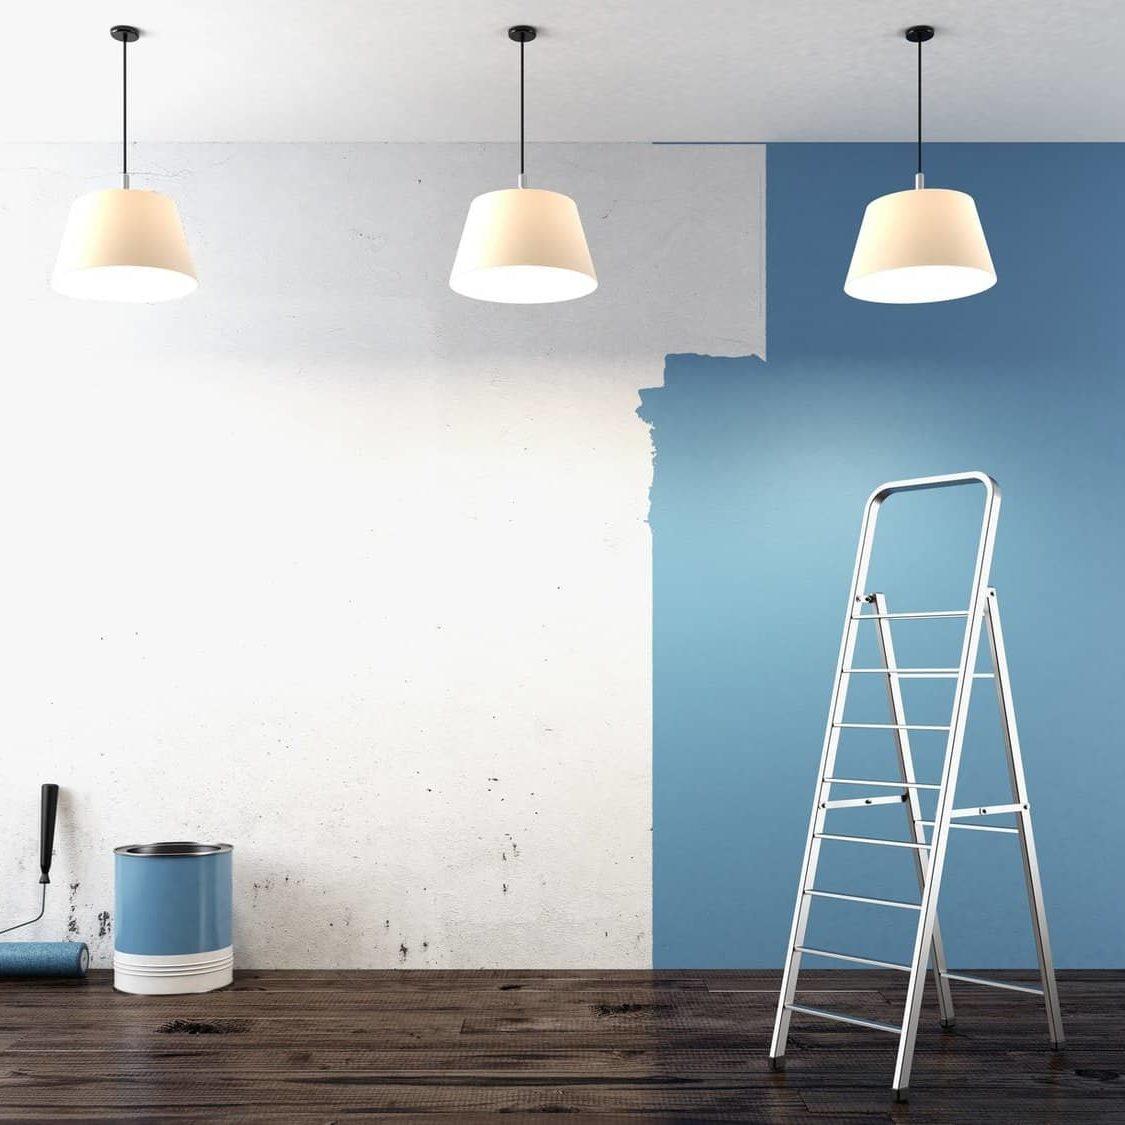 Interior Painting in Omaha, NE by Omaha Handyman Service